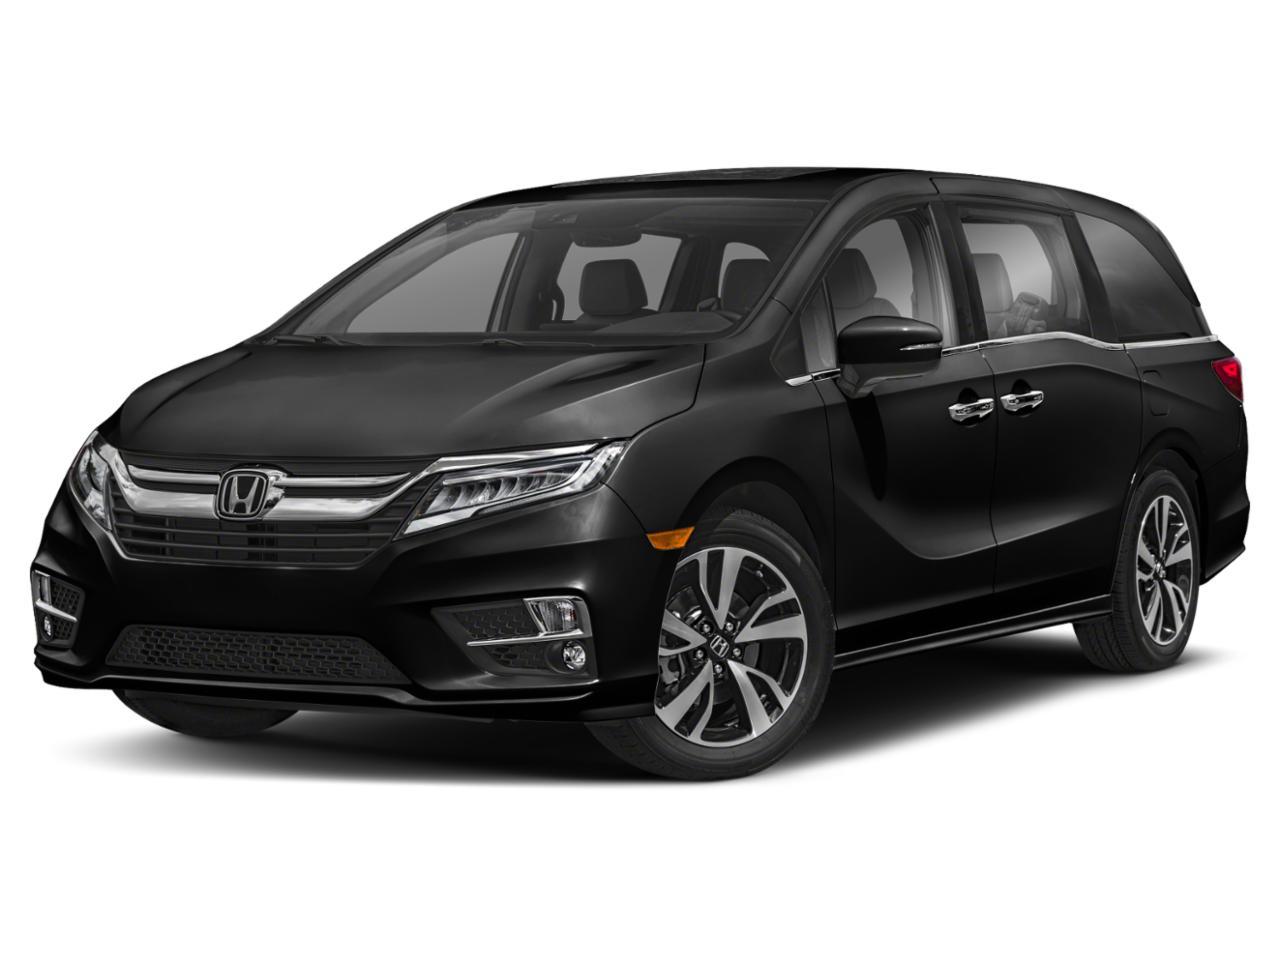 2019 Honda Odyssey Vehicle Photo in Nashua, NH 03060